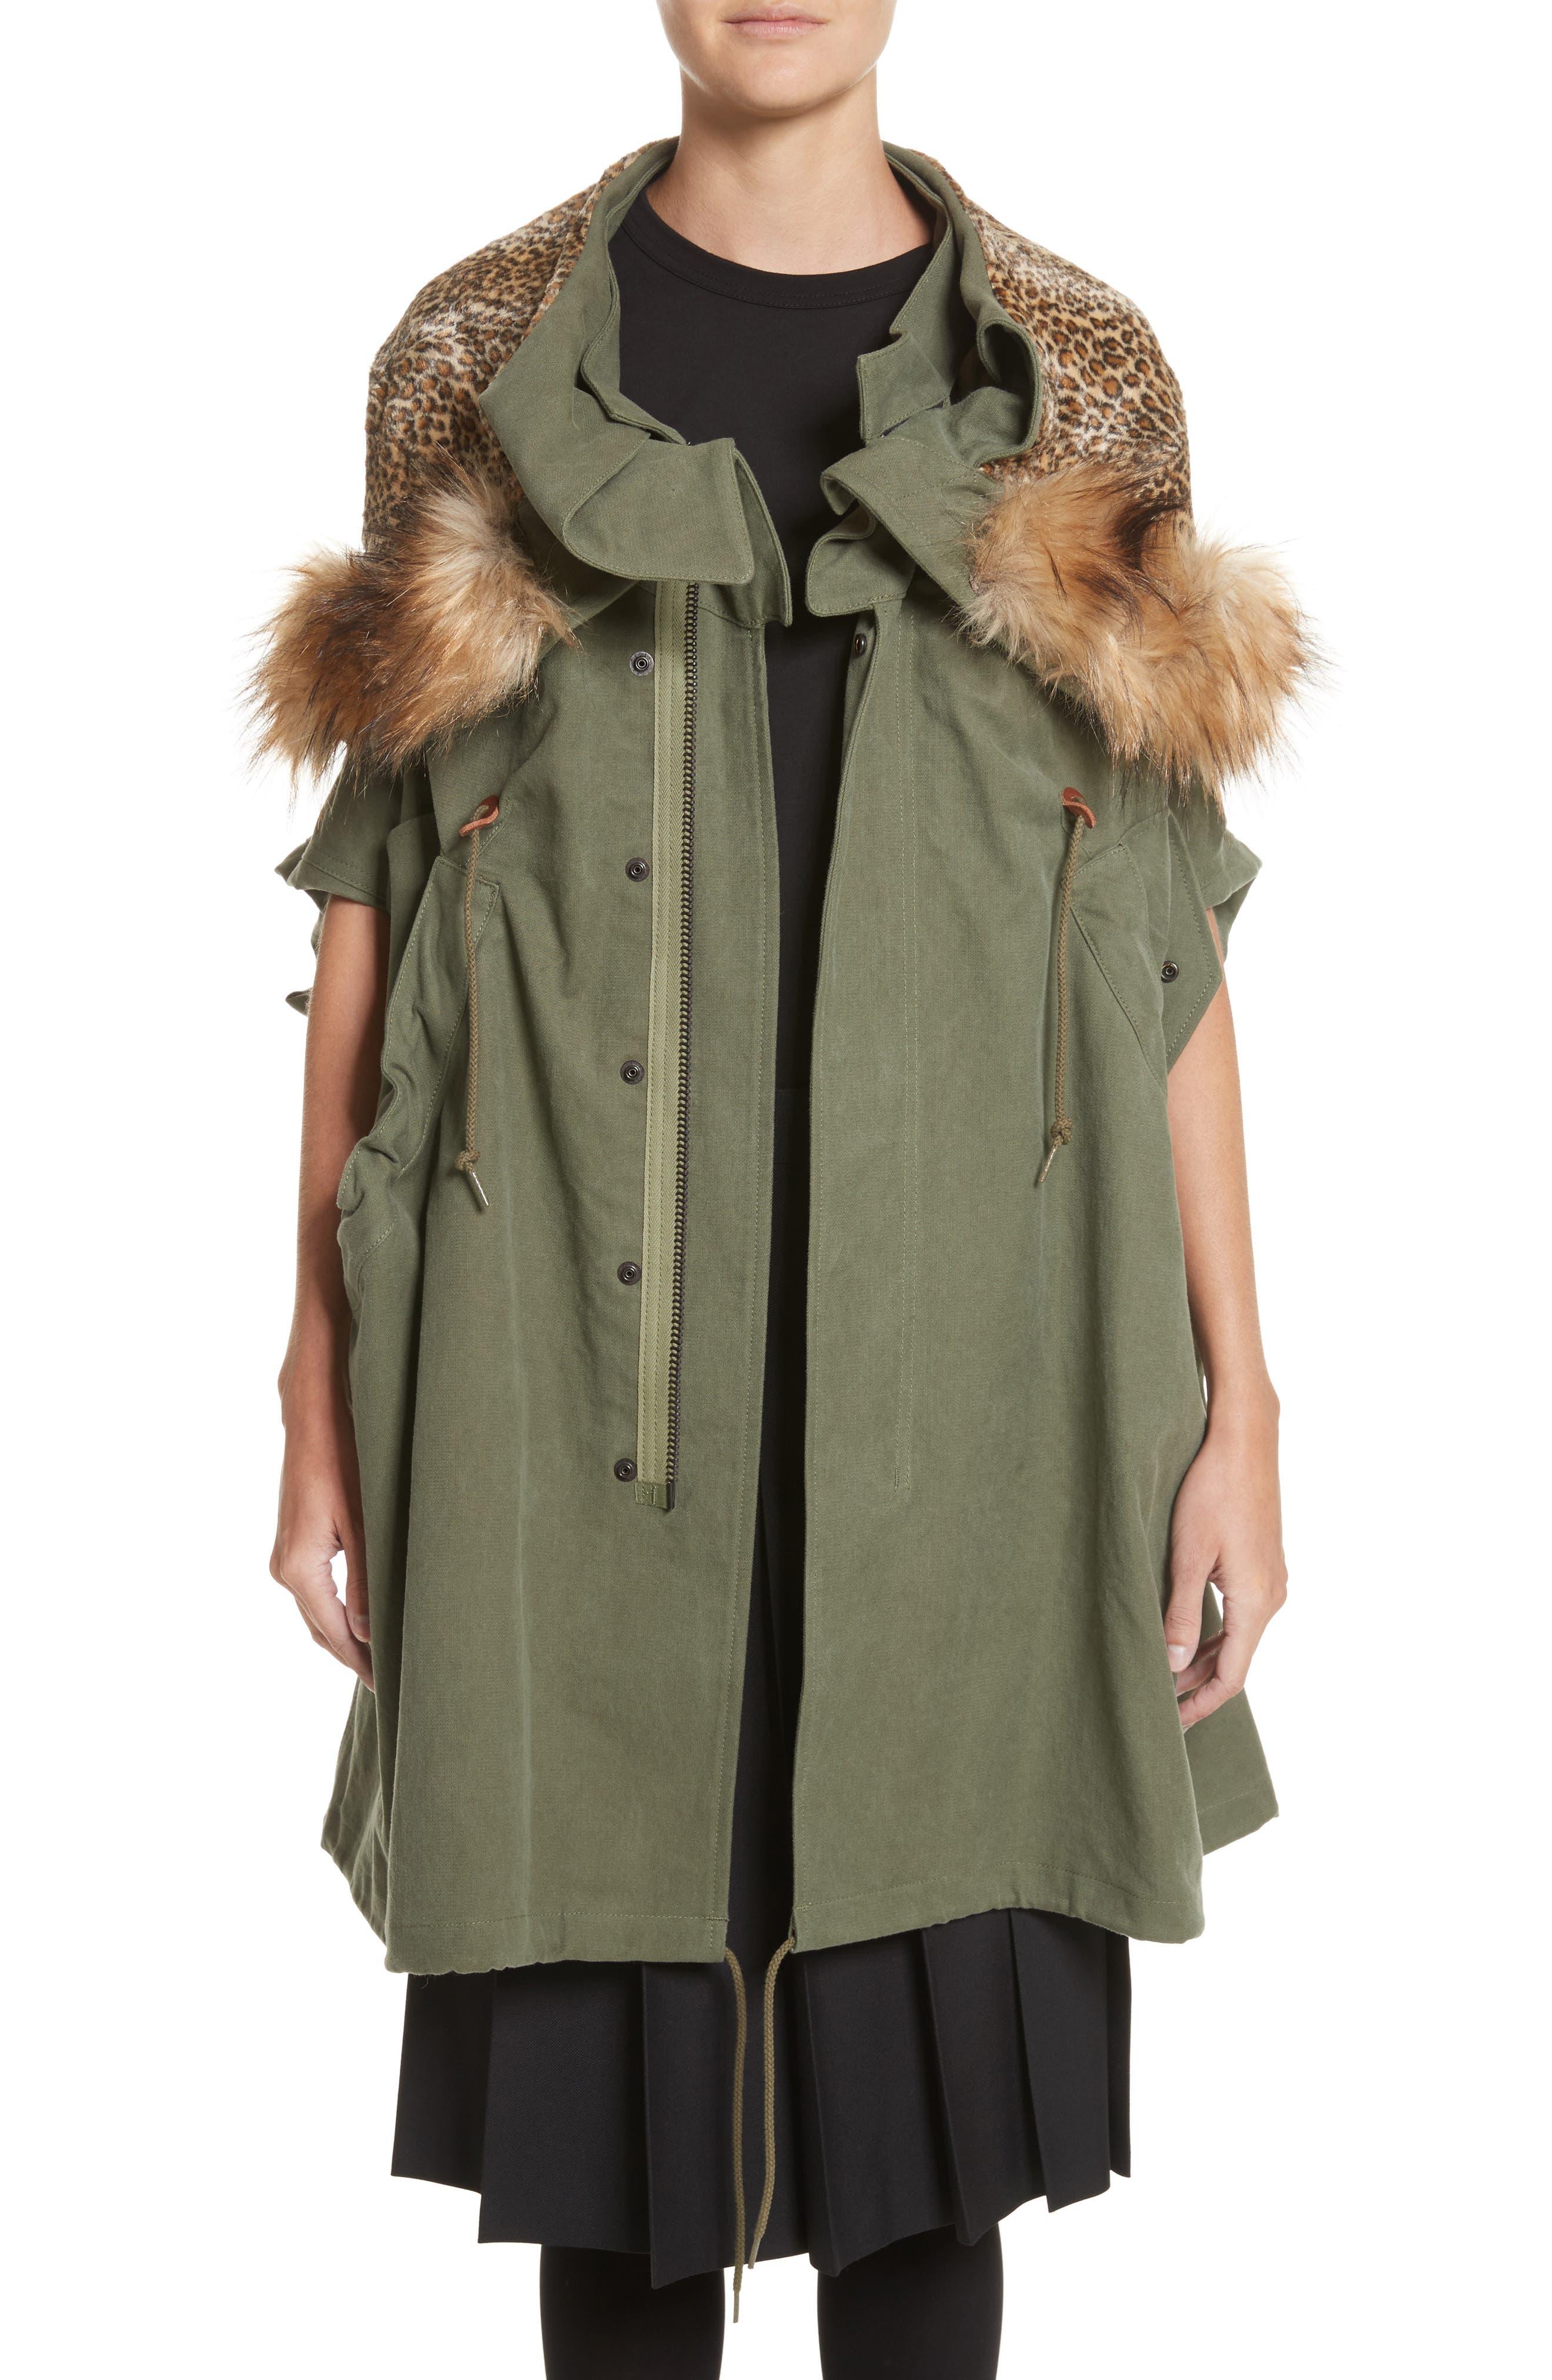 Army Coat with Cheetah Faux Fur Hood,                             Main thumbnail 1, color,                             340